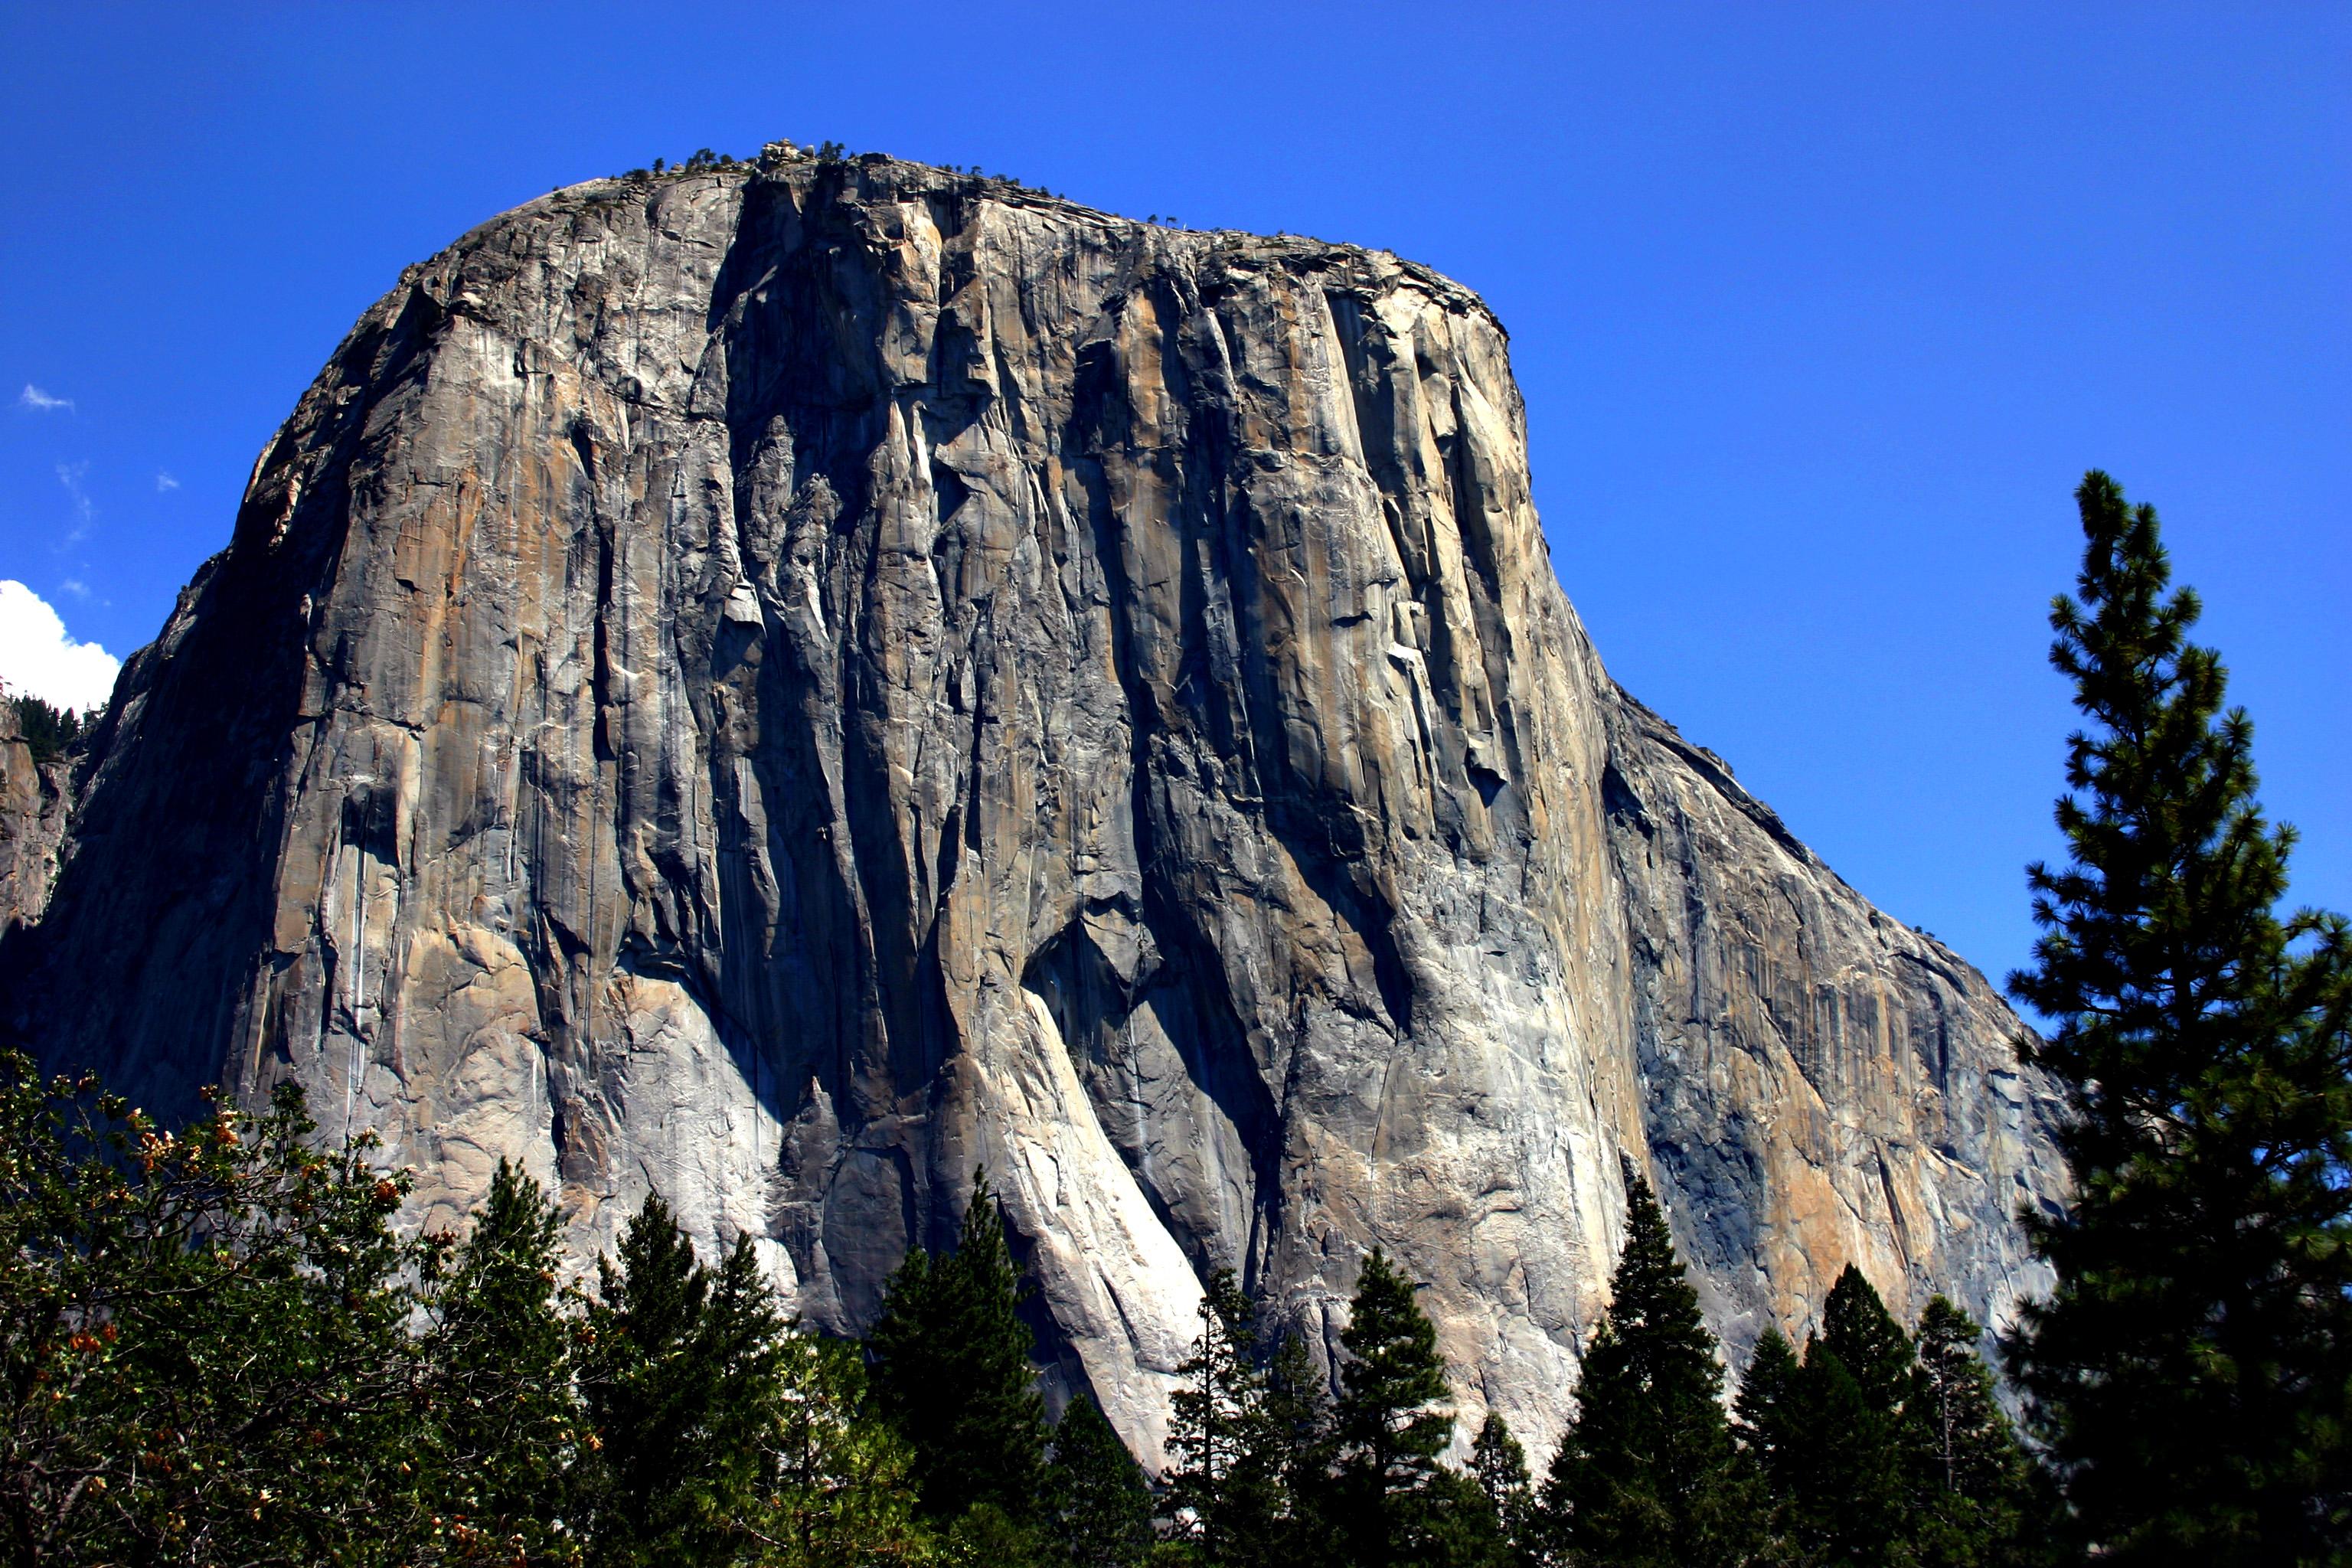 Yosemite_El_Capitan.